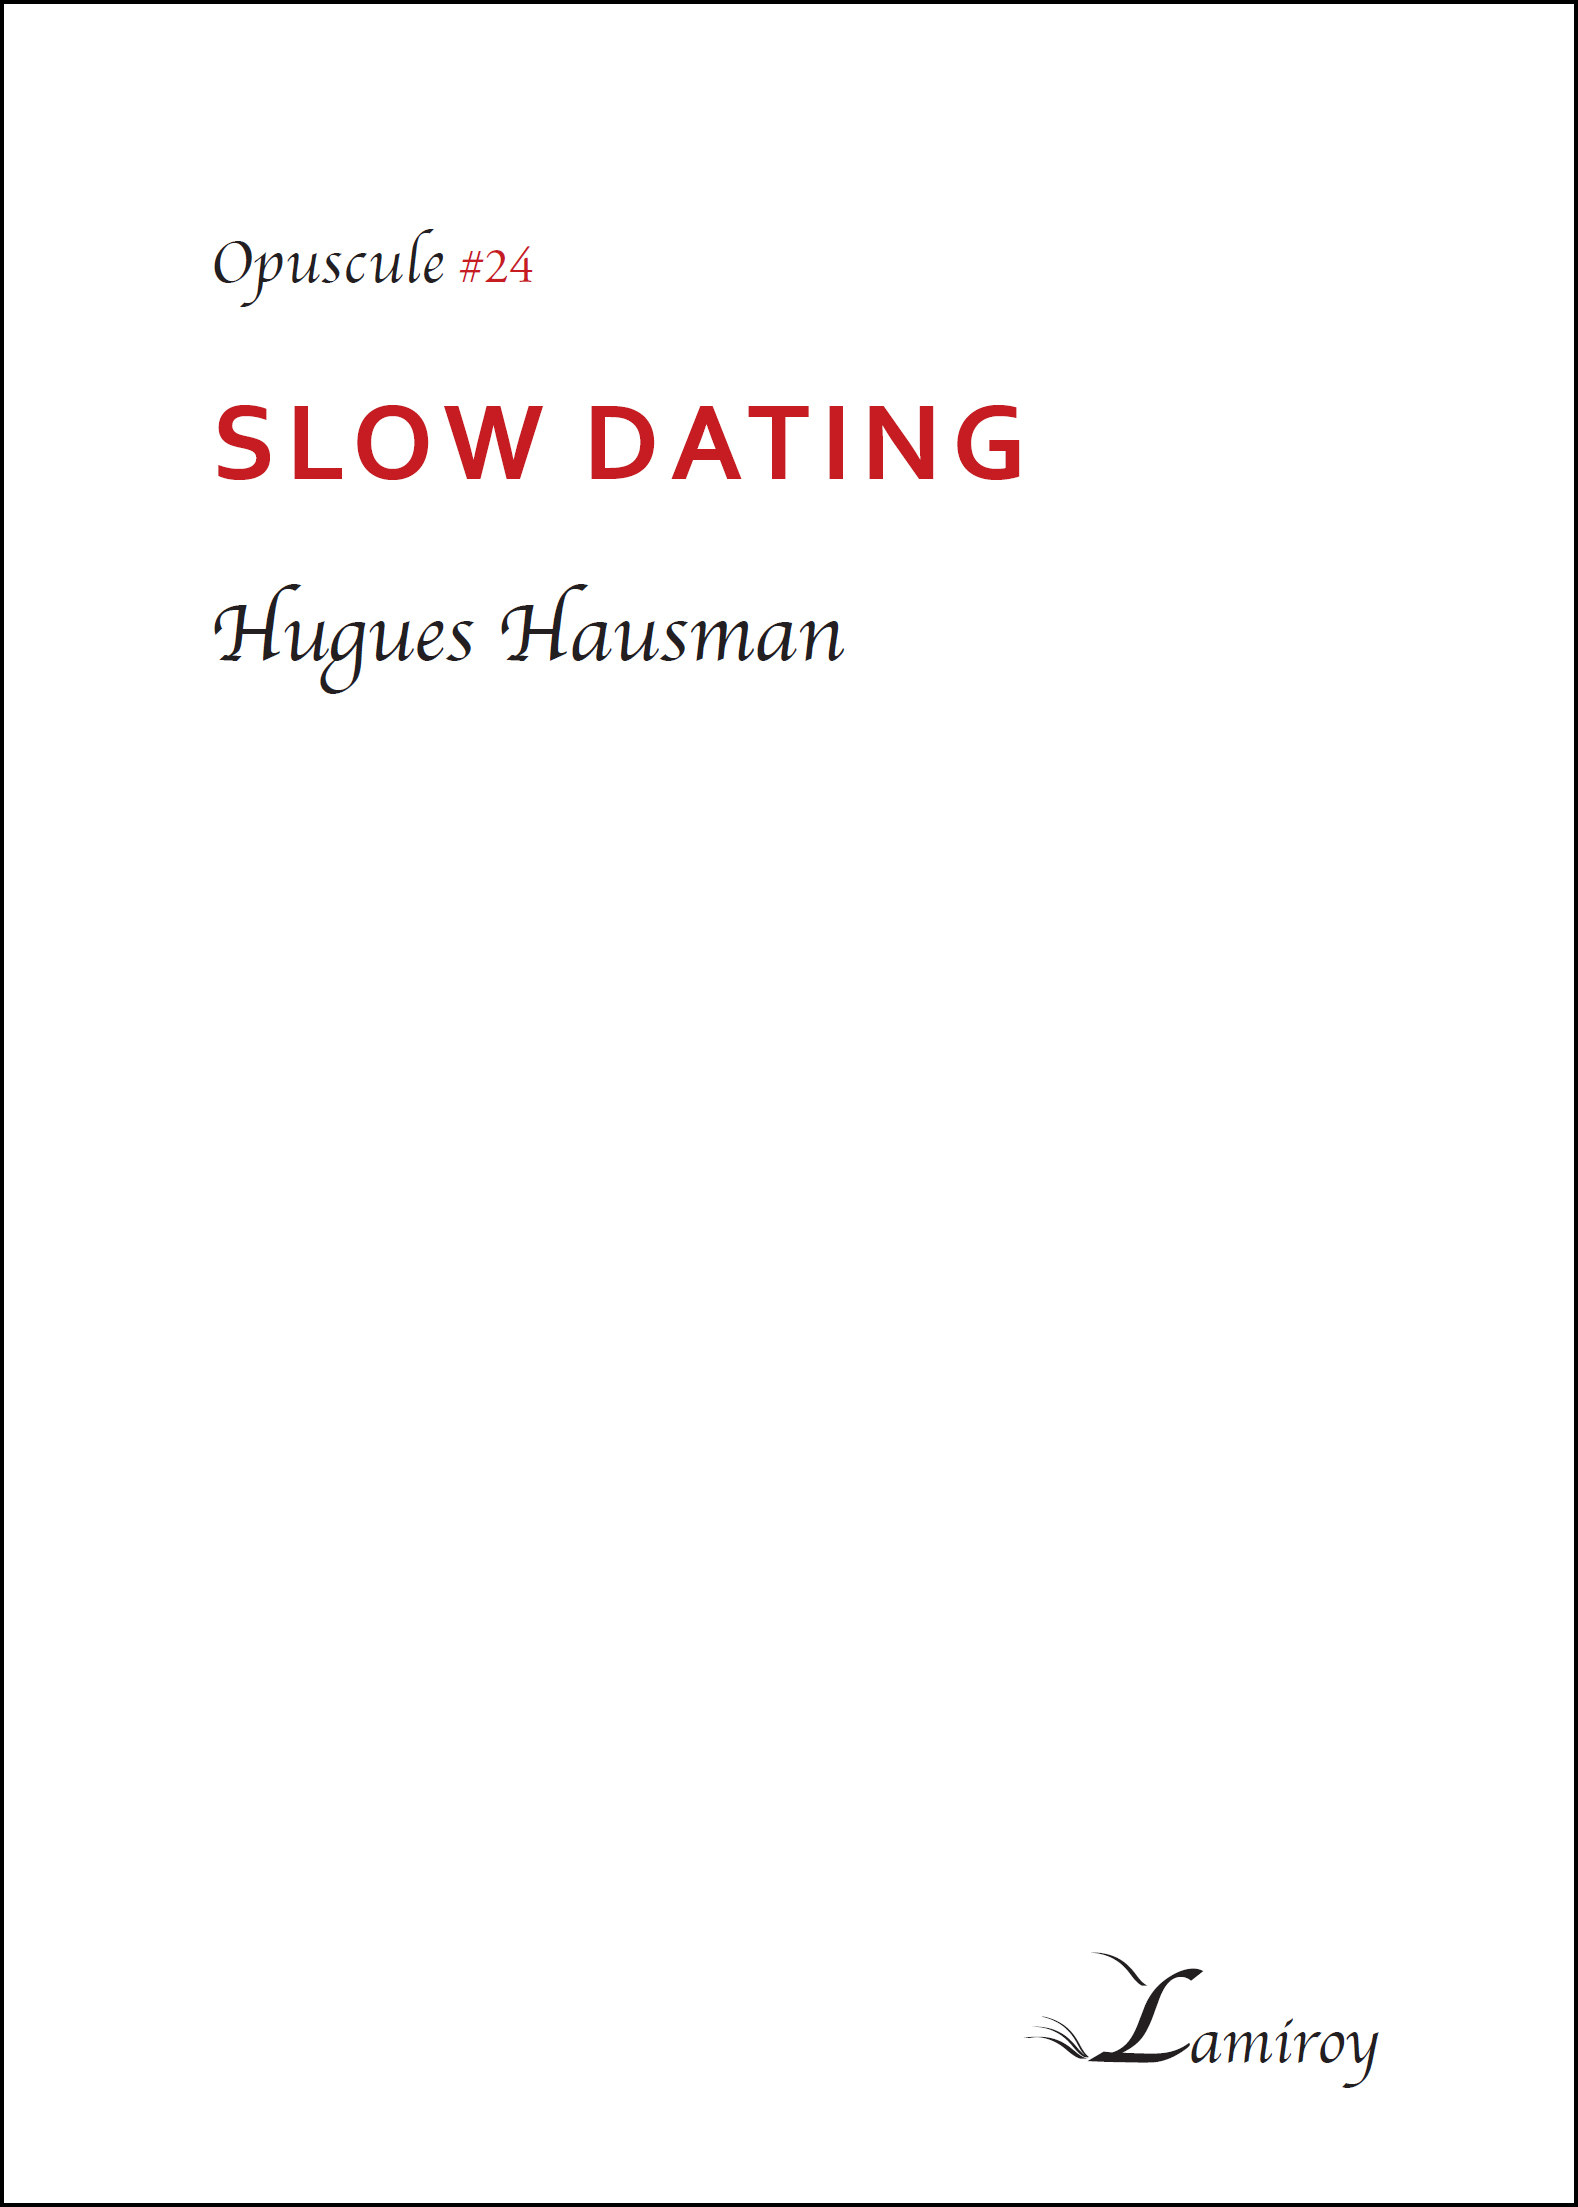 hugues hausman slow dating noir